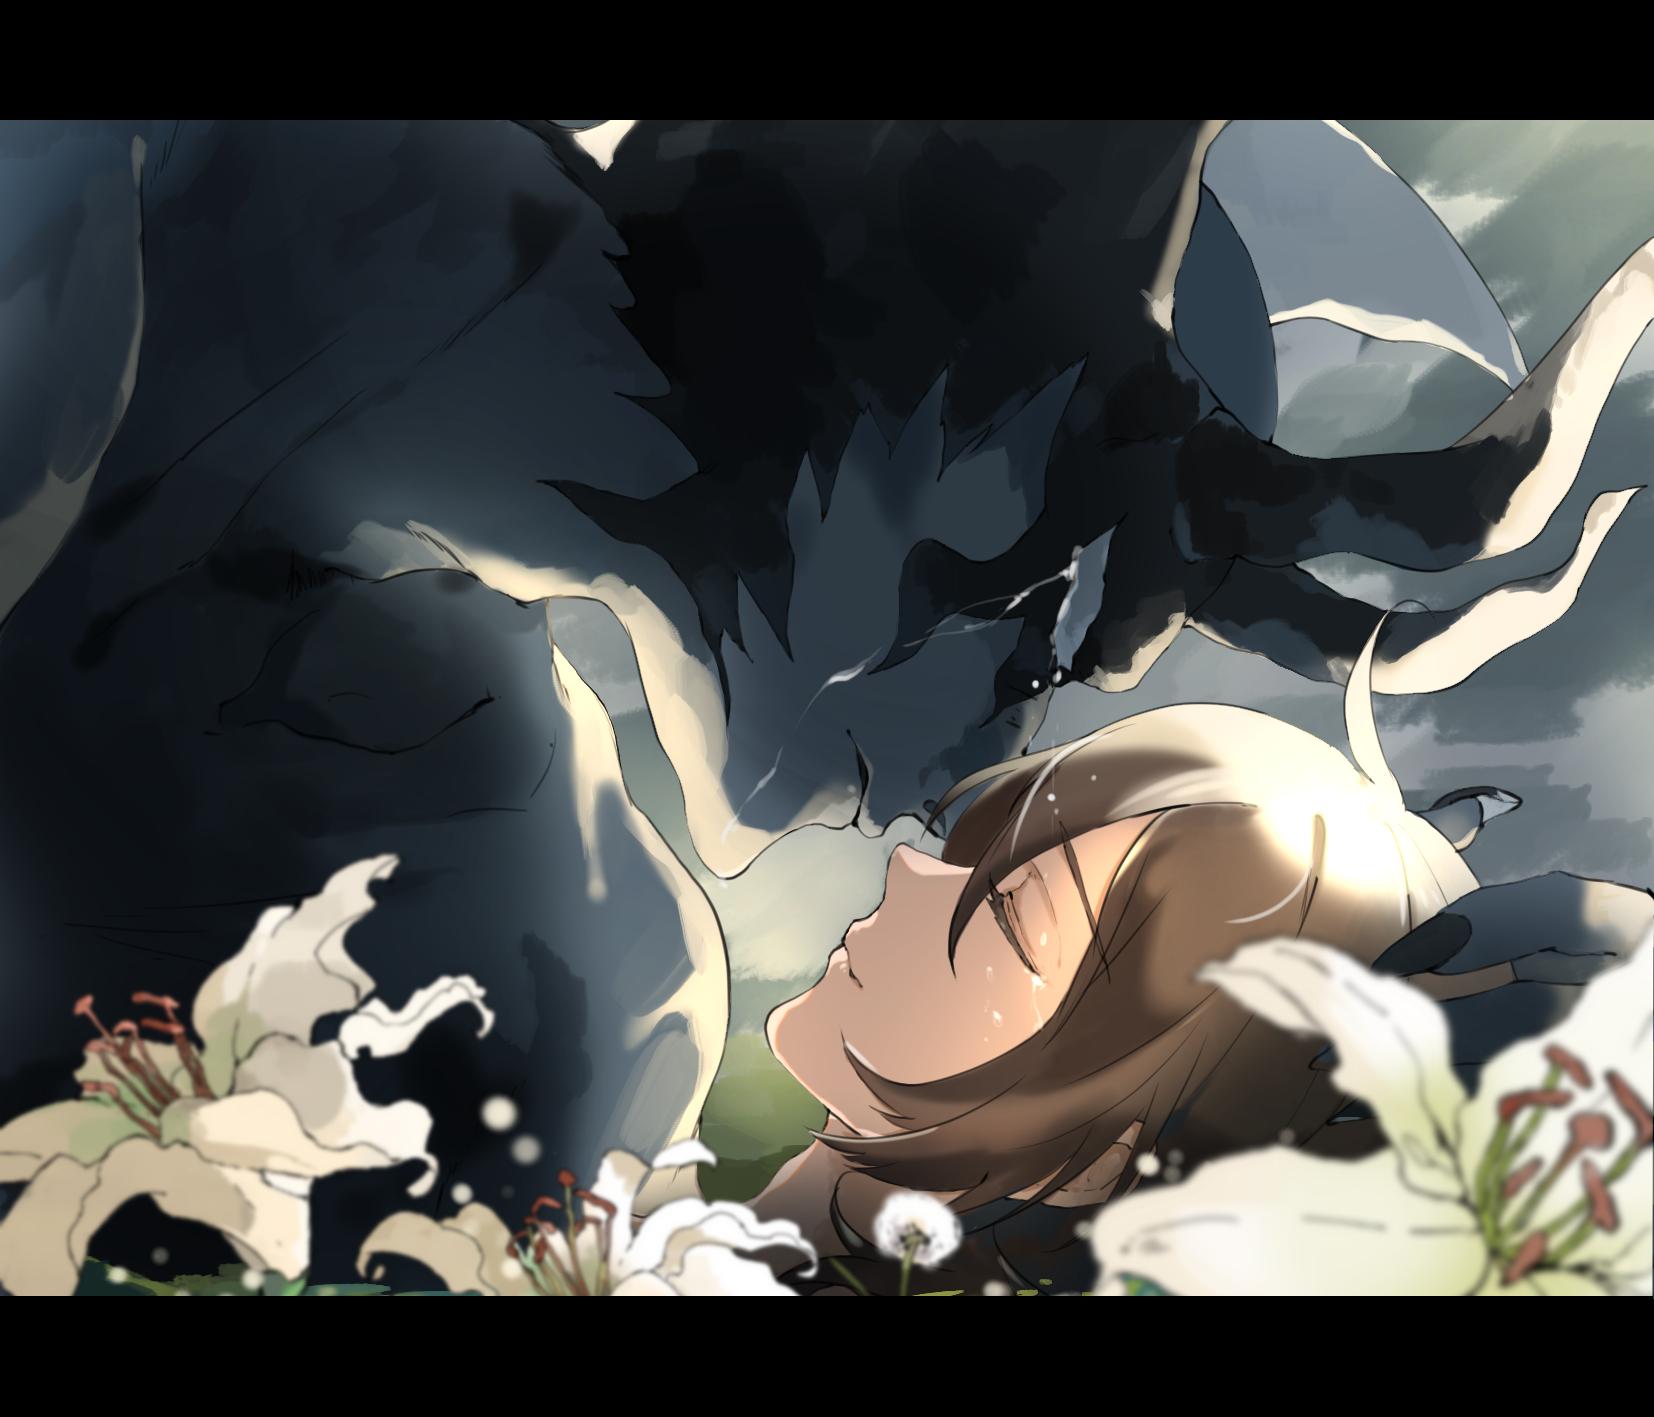 Devilman Crybaby Miki Makimura Akira Fudo Demon Crying Anime Girls Anime Boys 2d Demon Horns Closed Wallpaper Resolution 1654x1417 Id 671731 Wallha Com